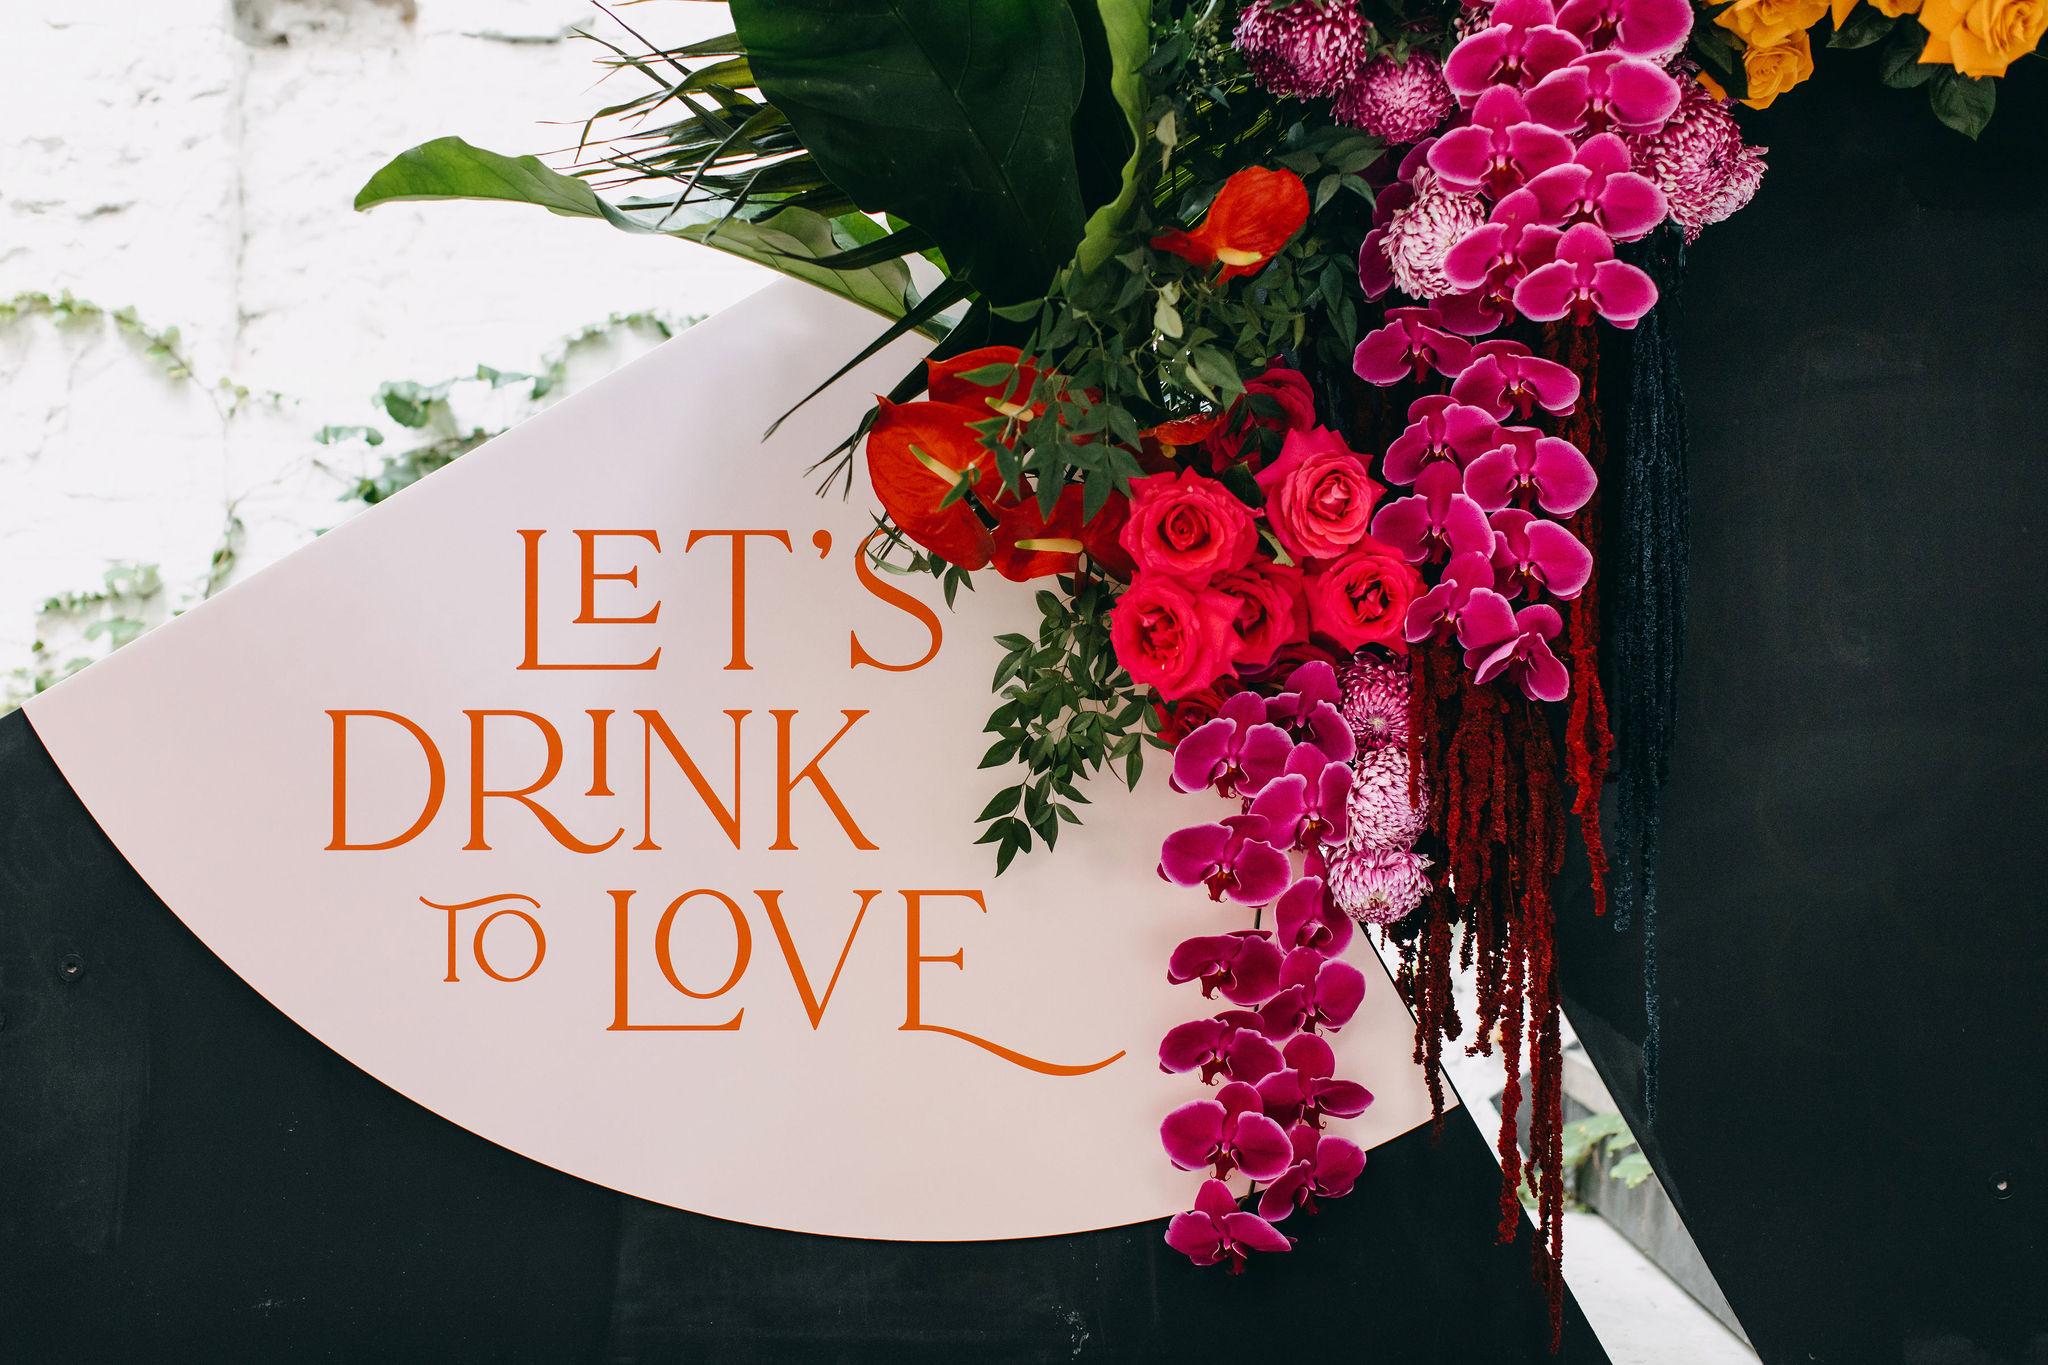 27-STATEBUILDINGS-WEDDINGOPENDAY-16FEB2020